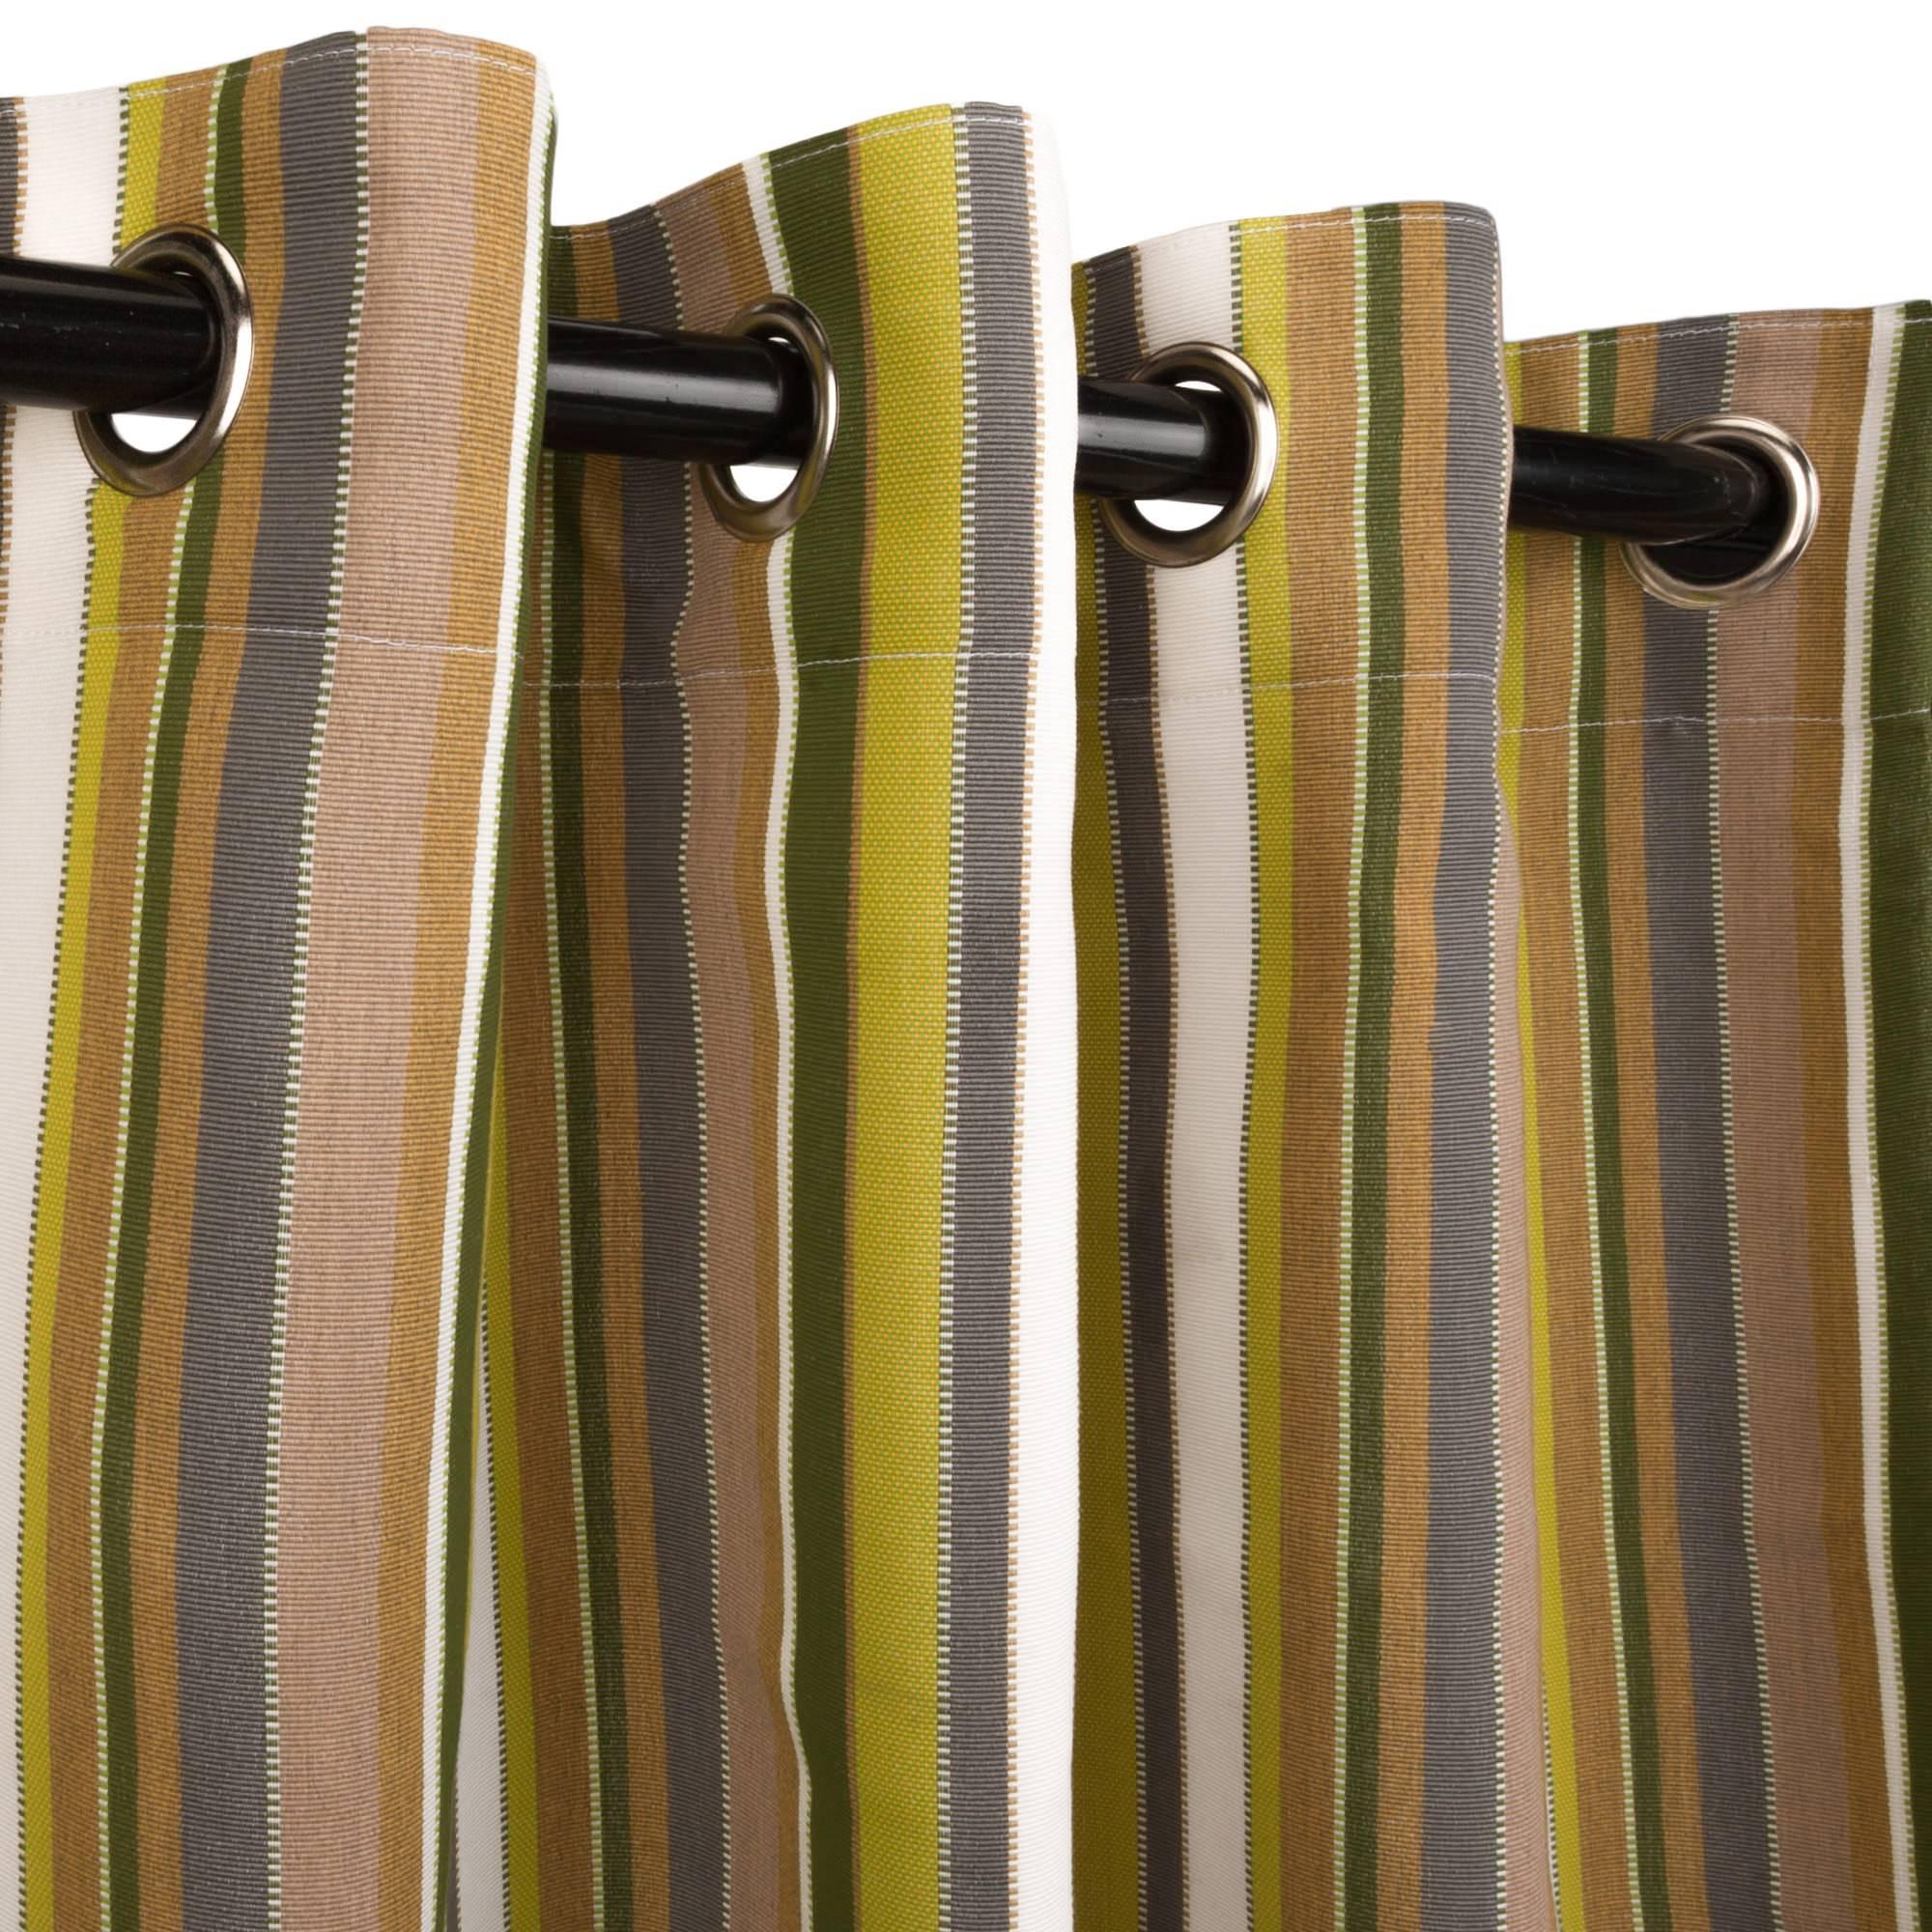 Outdoor curtains - Carousel Limelight Sunbrella Nickel Grommeted Outdoor Curtain